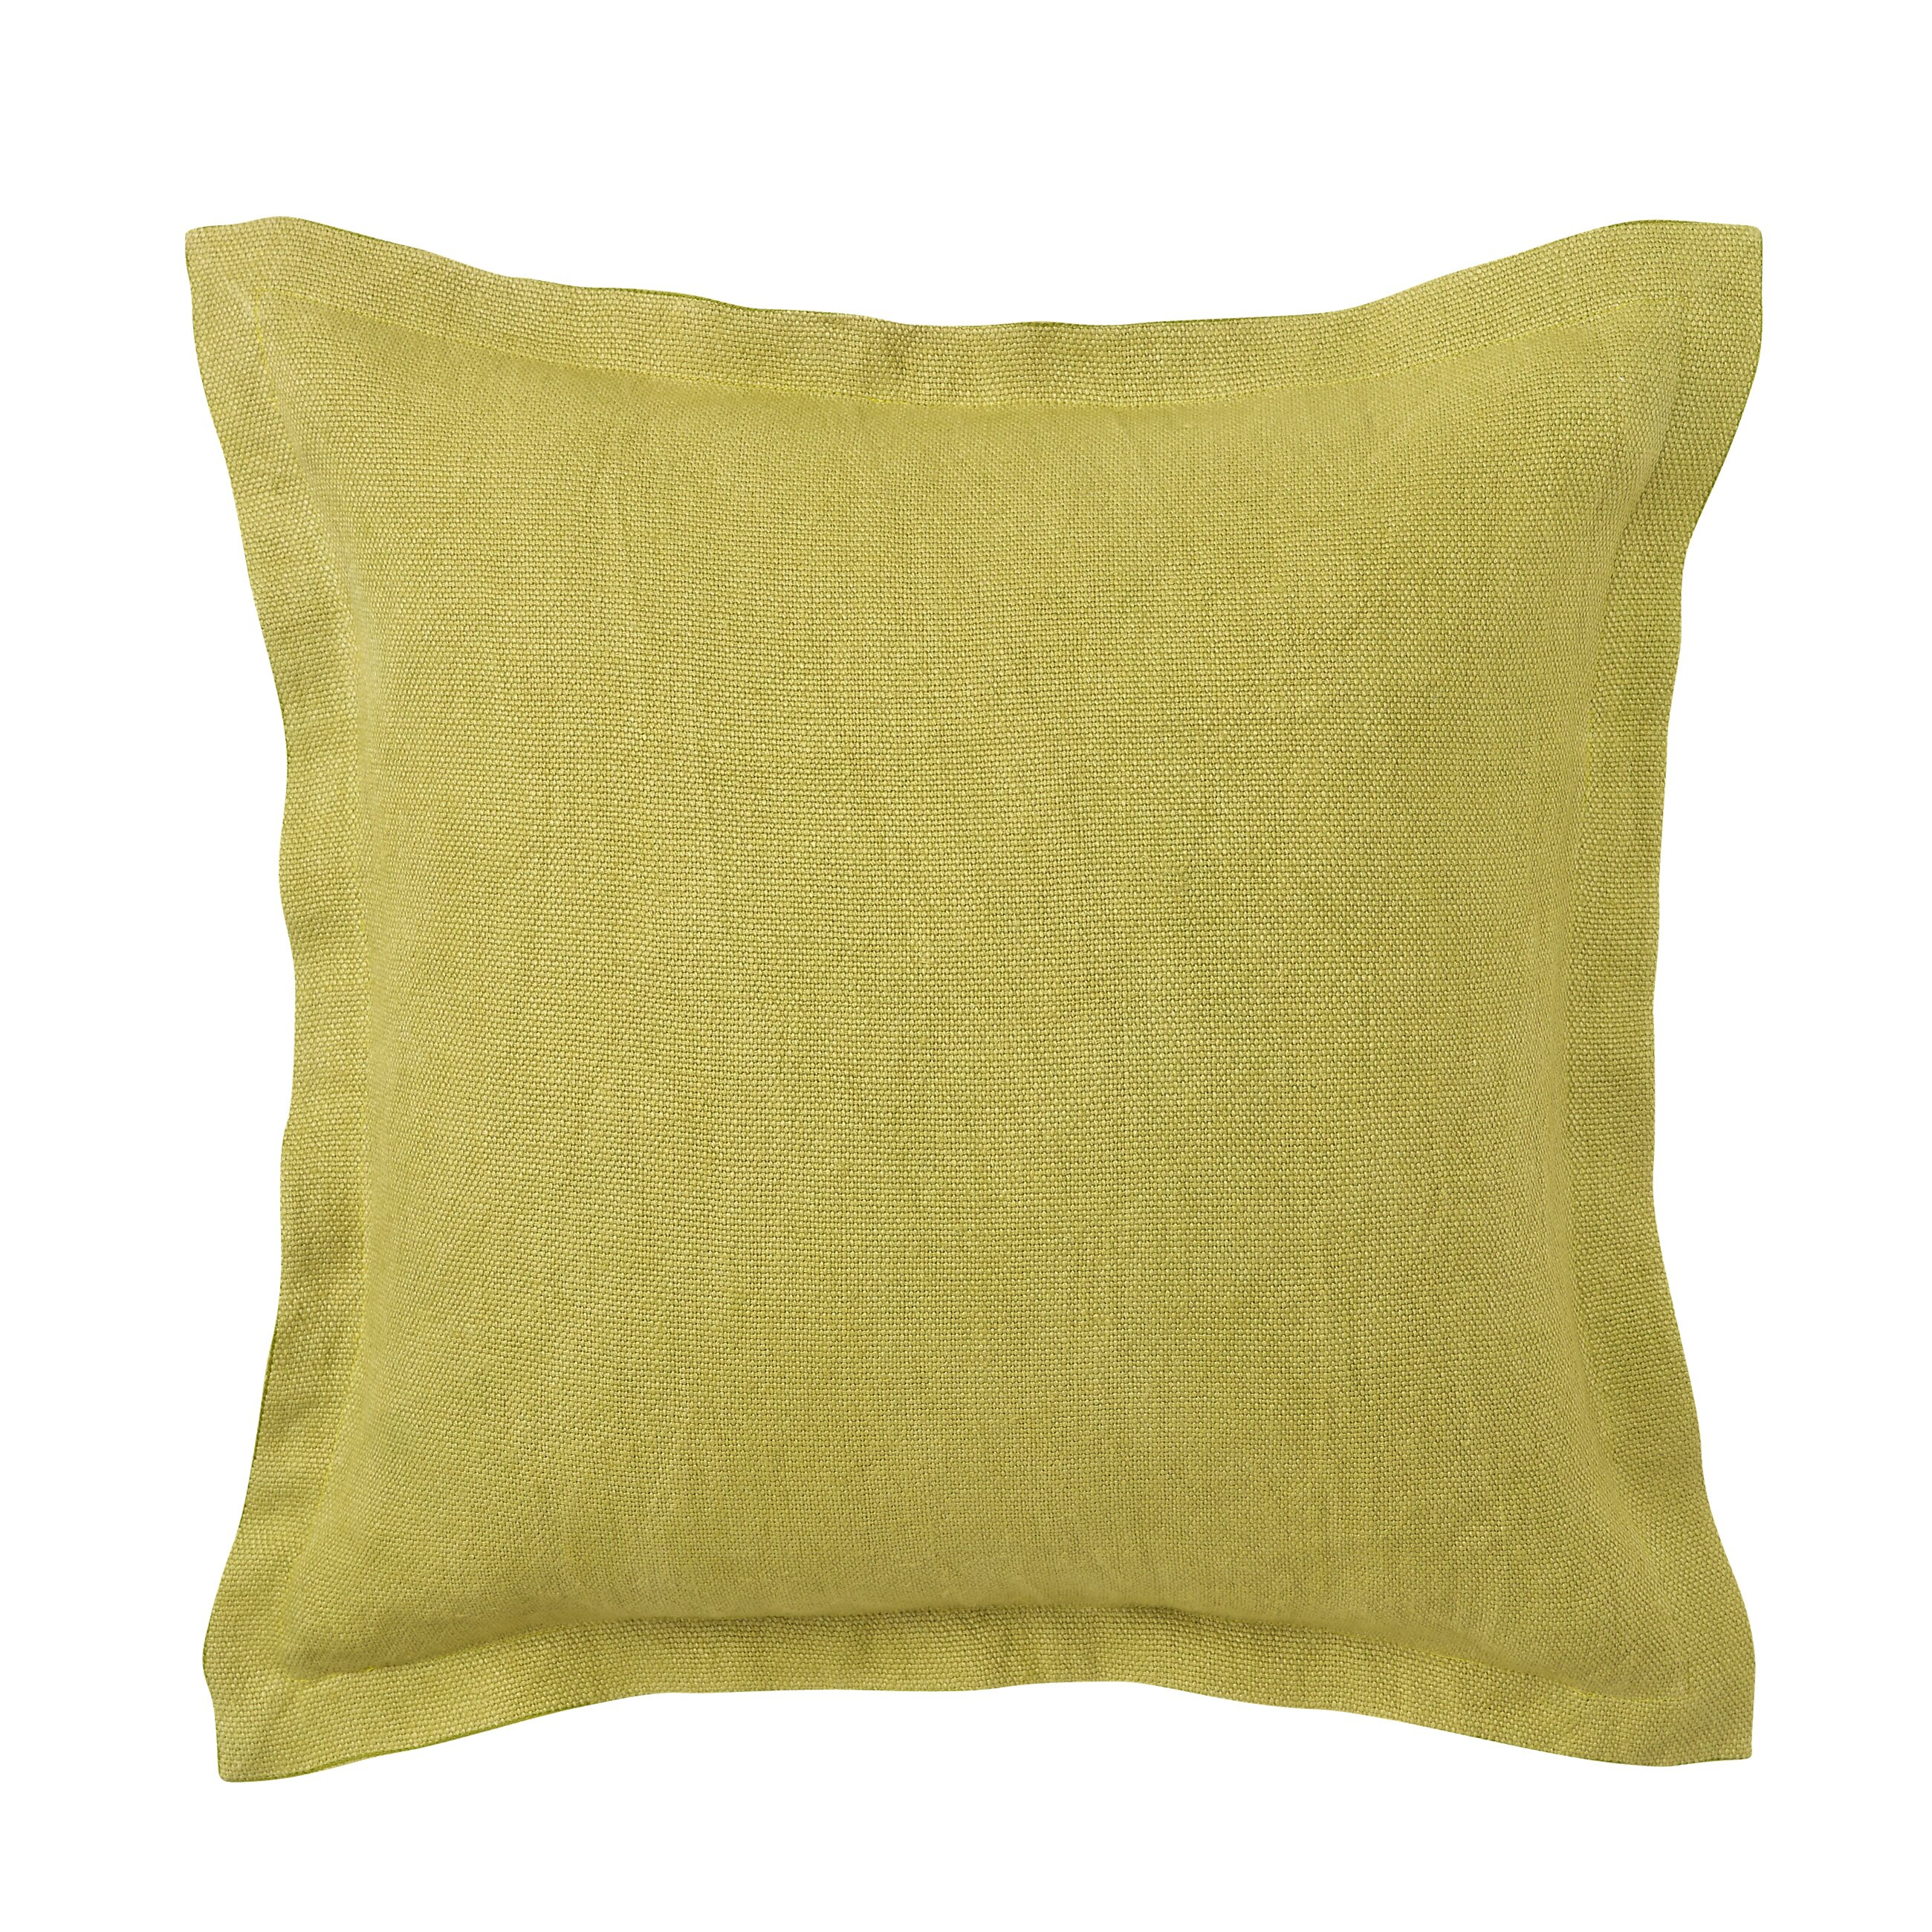 Lavender Throw Pillows : Company C Parasol Linen Throw Pillow & Reviews Wayfair.ca